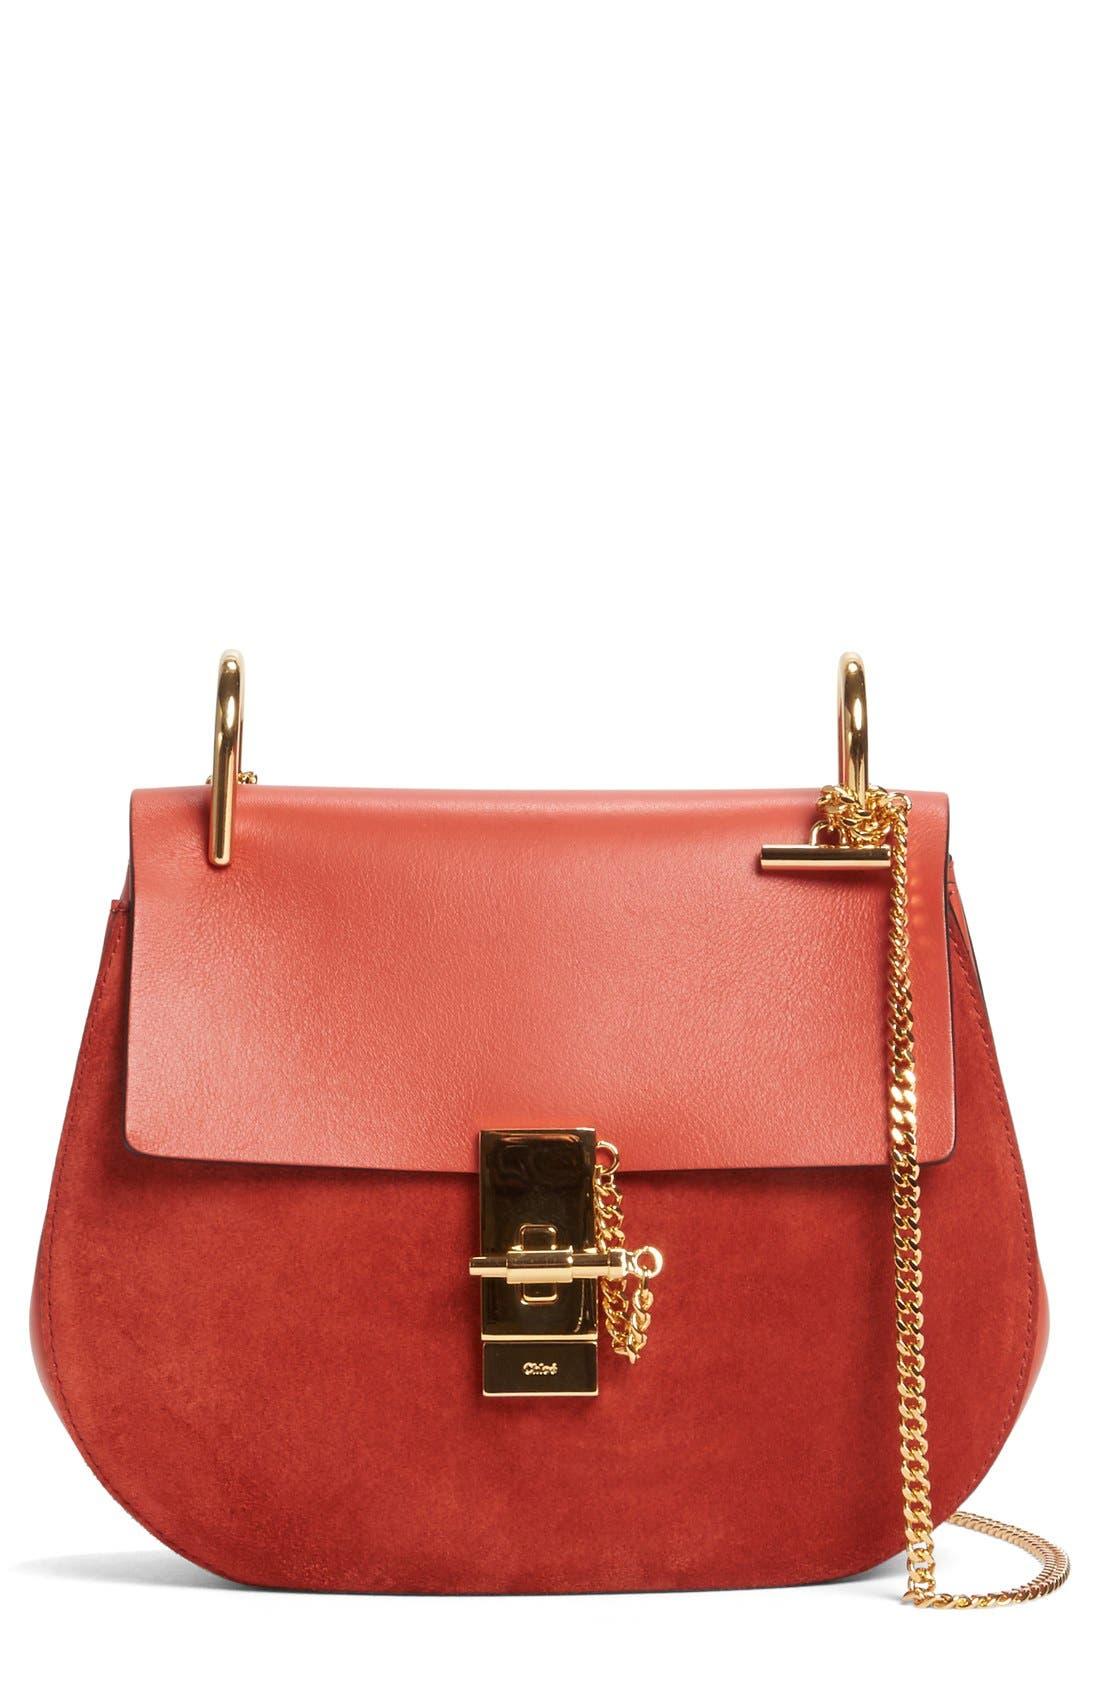 'Mini Drew' Leather Crossbody Bag,                             Main thumbnail 1, color,                             626